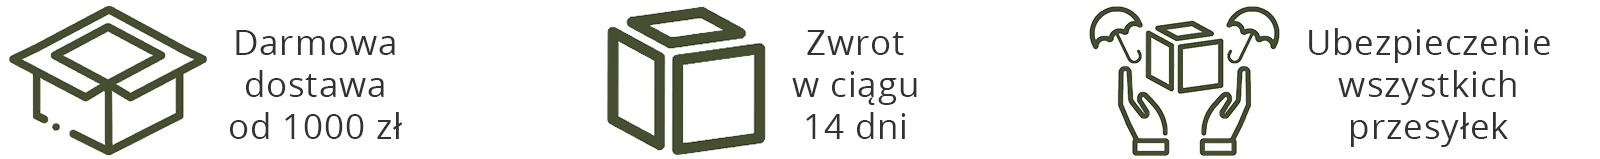 info-wysylki-2.jpg